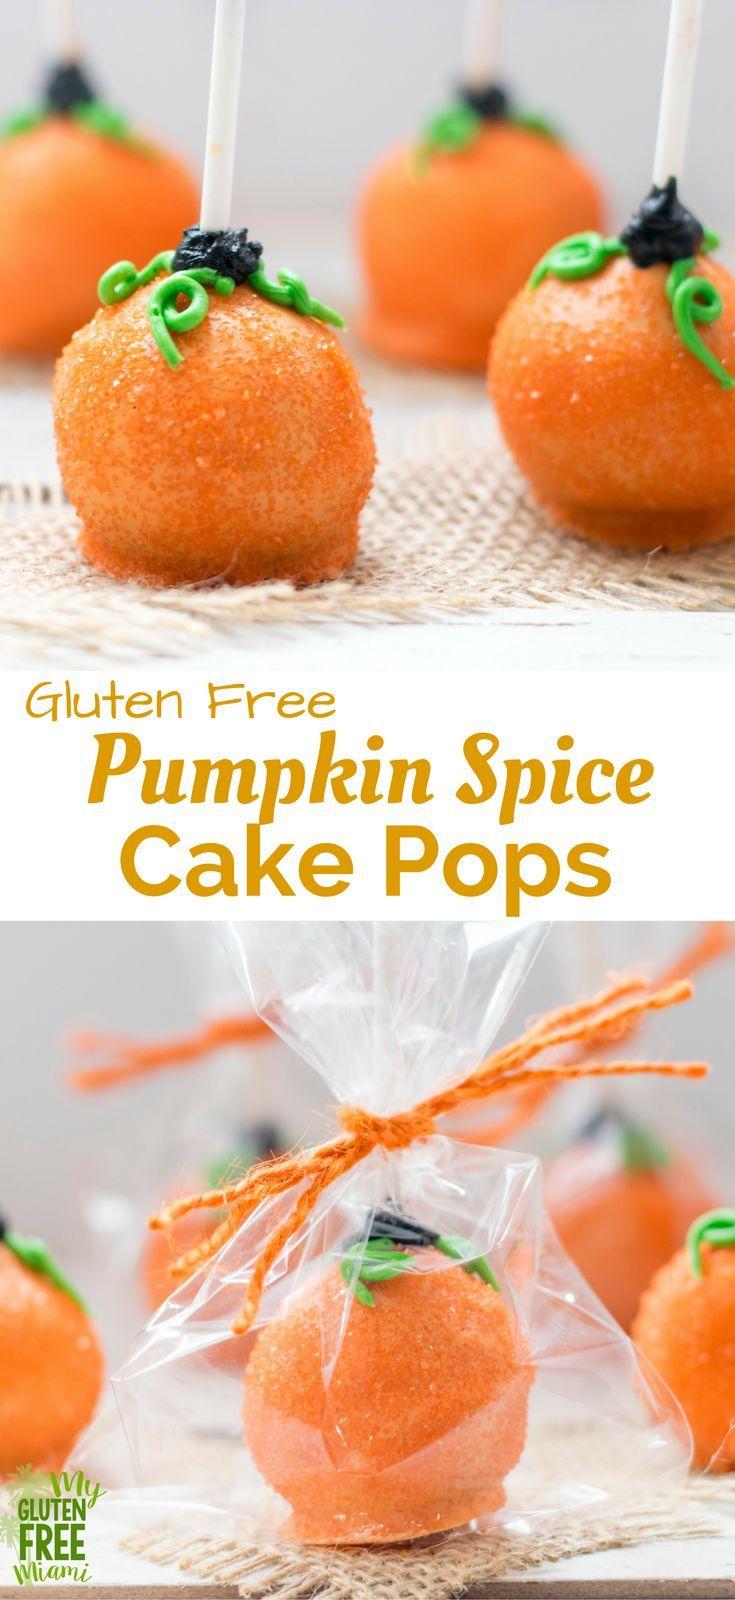 Gluten Free Pumpkin Spice Cake Pops